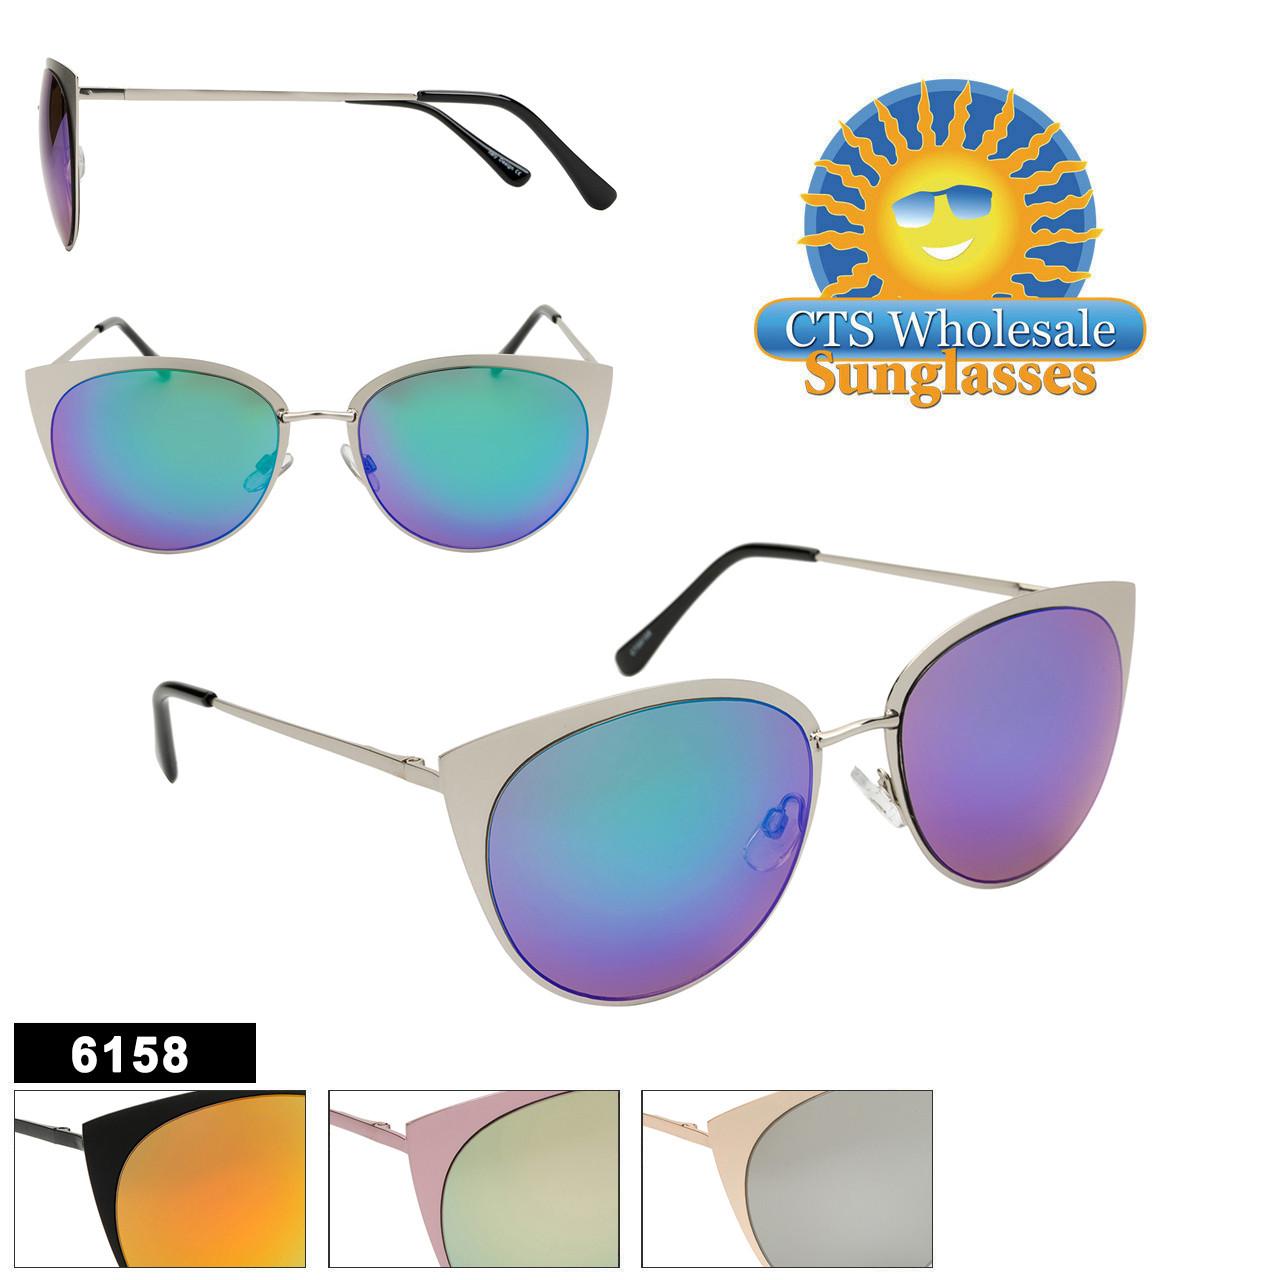 Wholesale Sunglasses - Style #6158